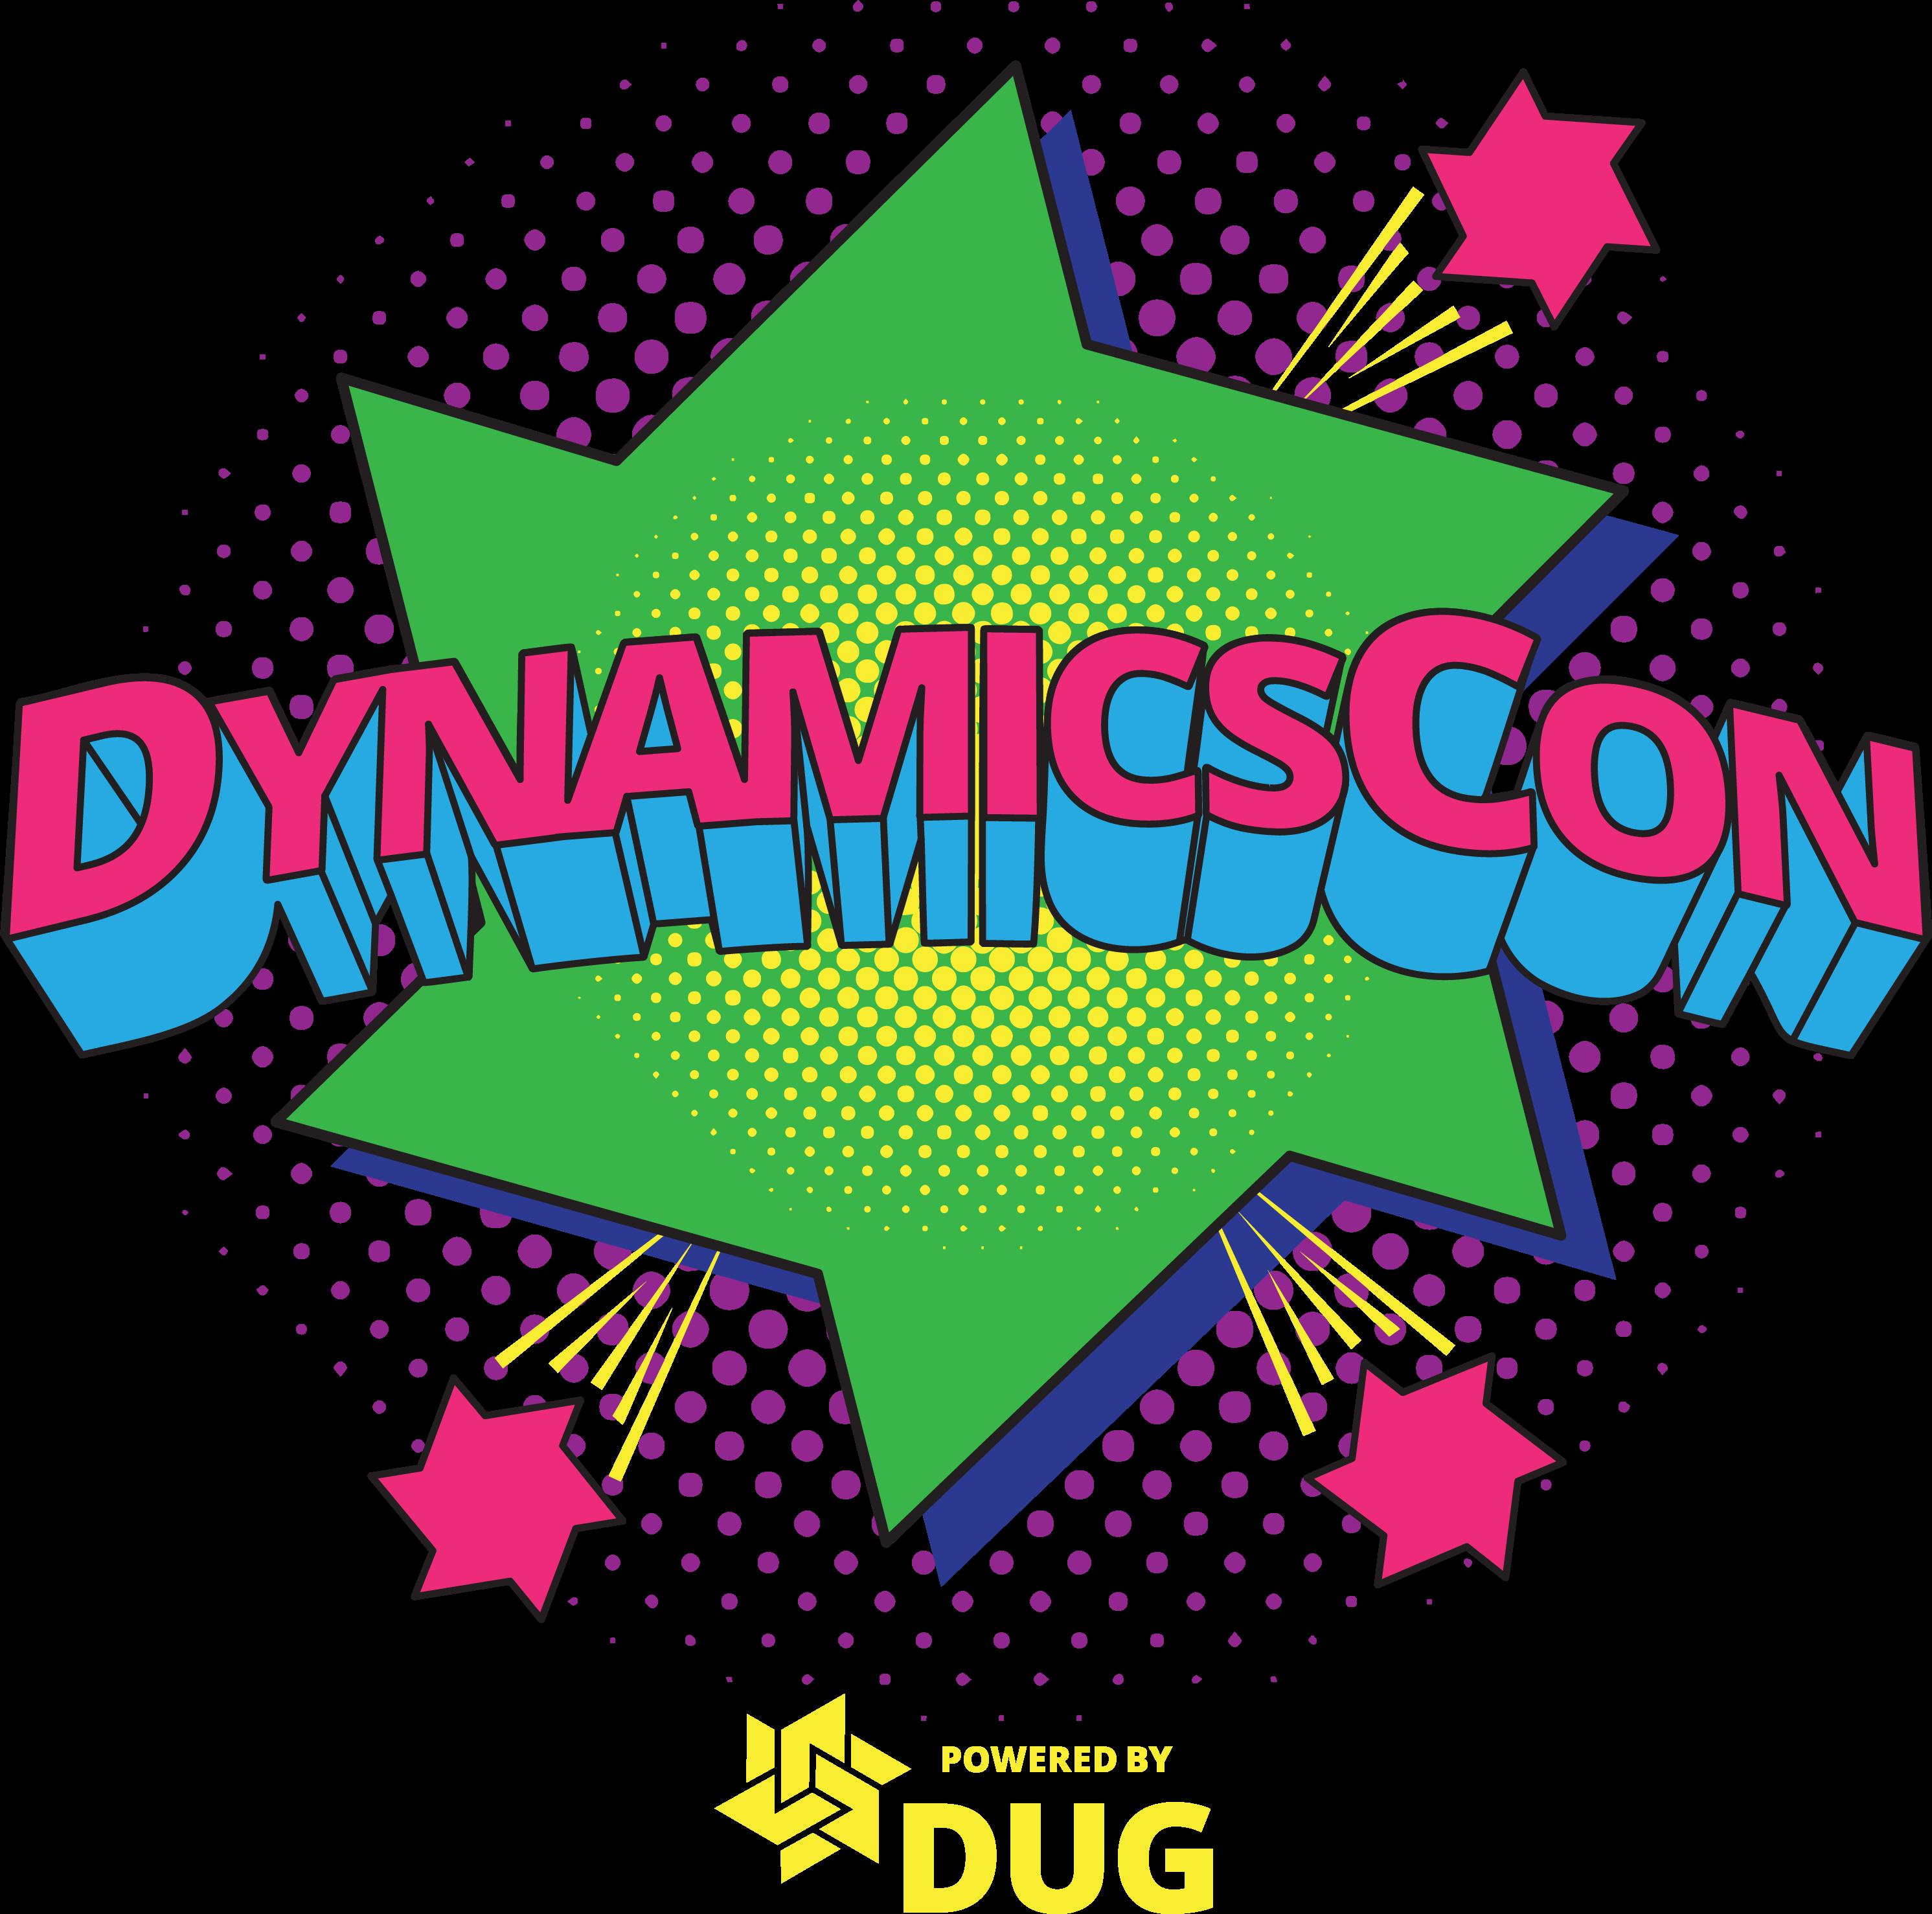 DynamicsCon 2021